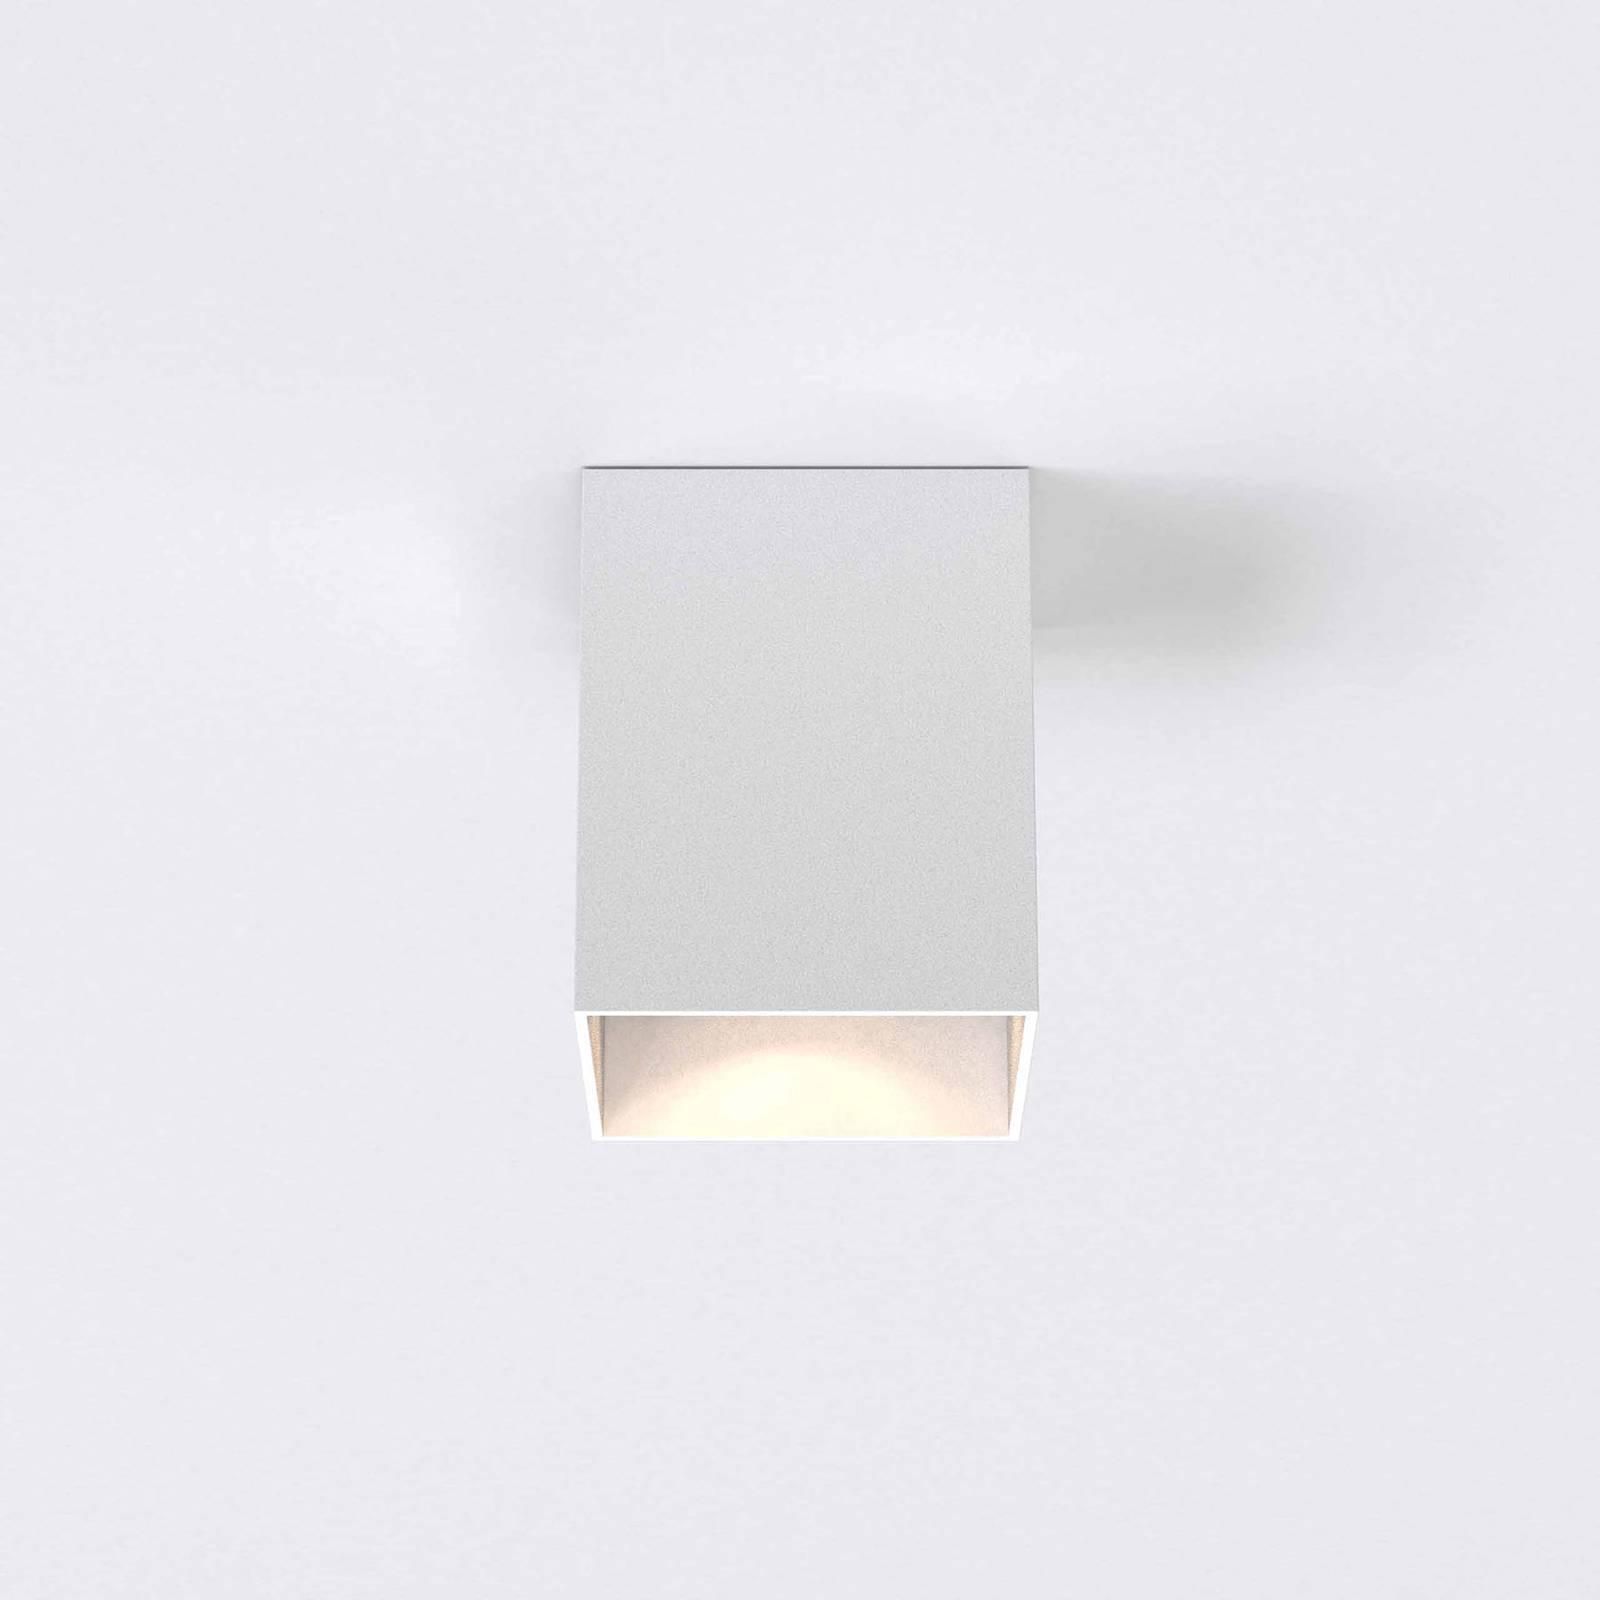 Astro Kinzo 140 LED plafondlamp, wit